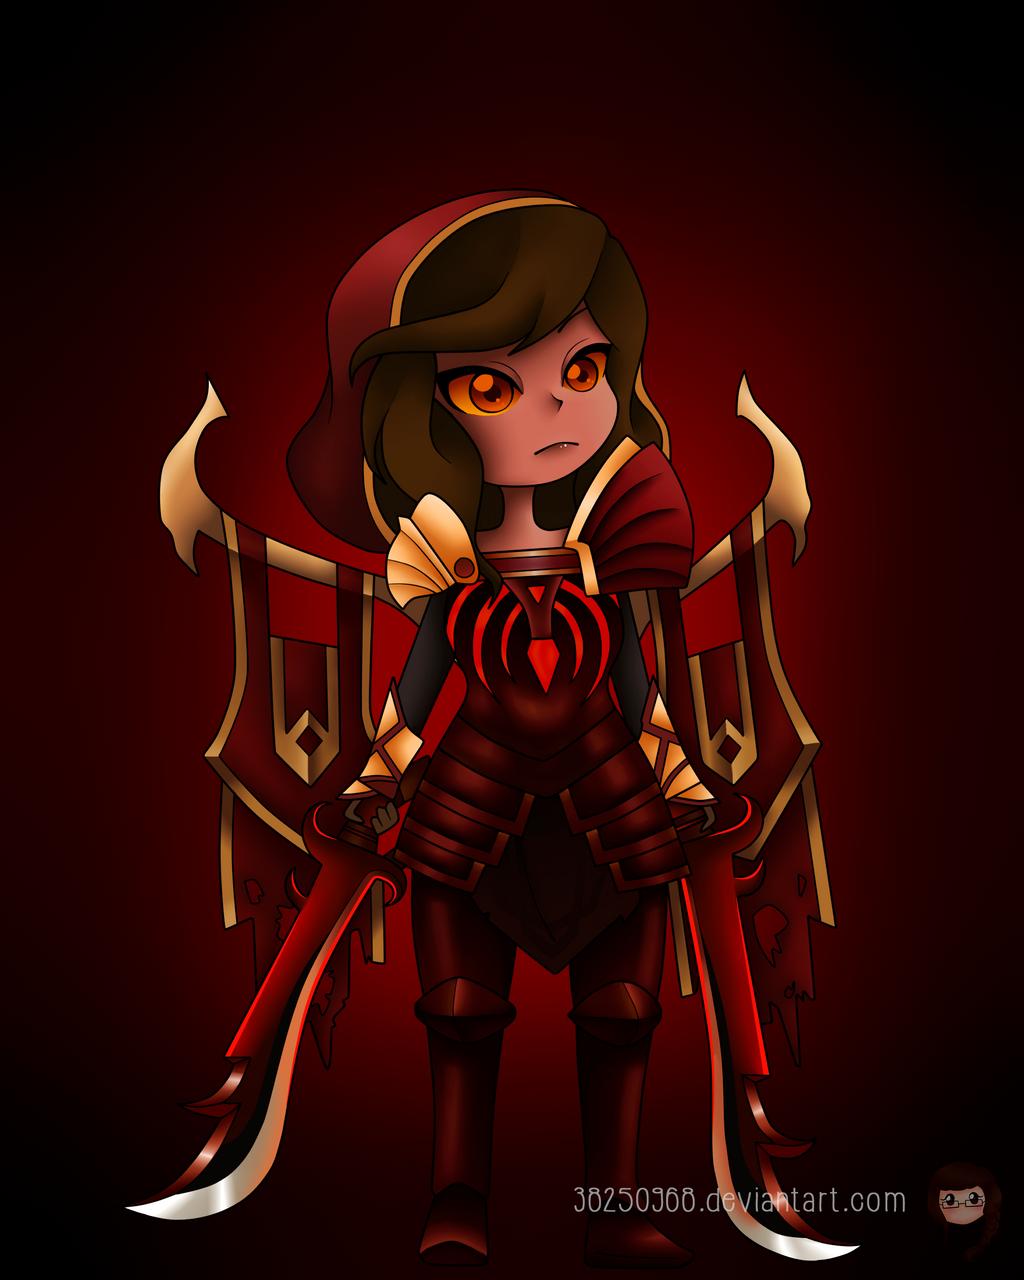 Chibi Legion Commander :) by 38250968 on DeviantArt